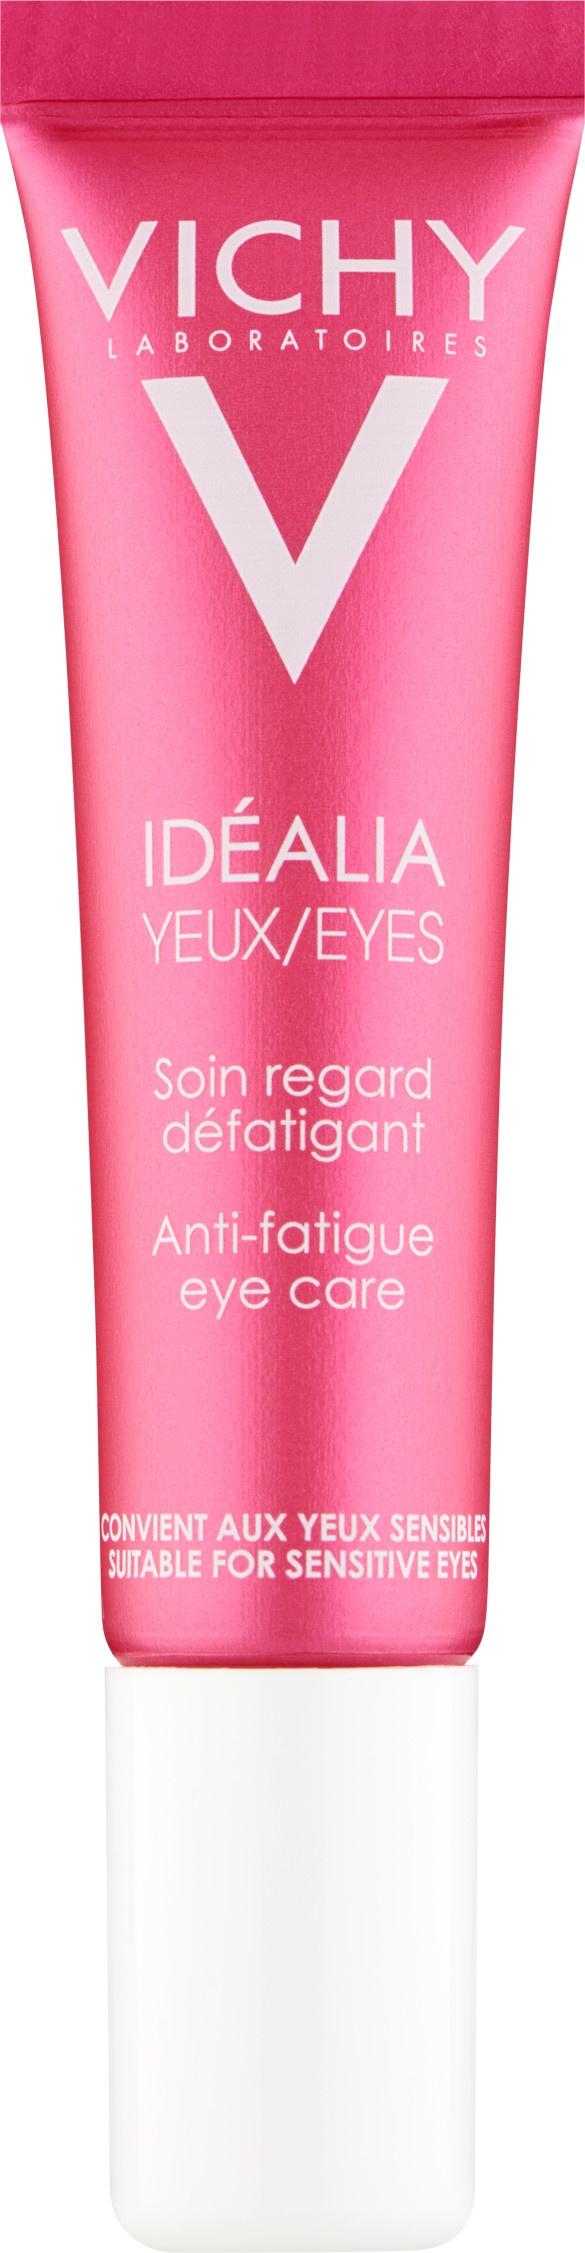 Vichy Idéalia Anti-Fatigue Eye Care